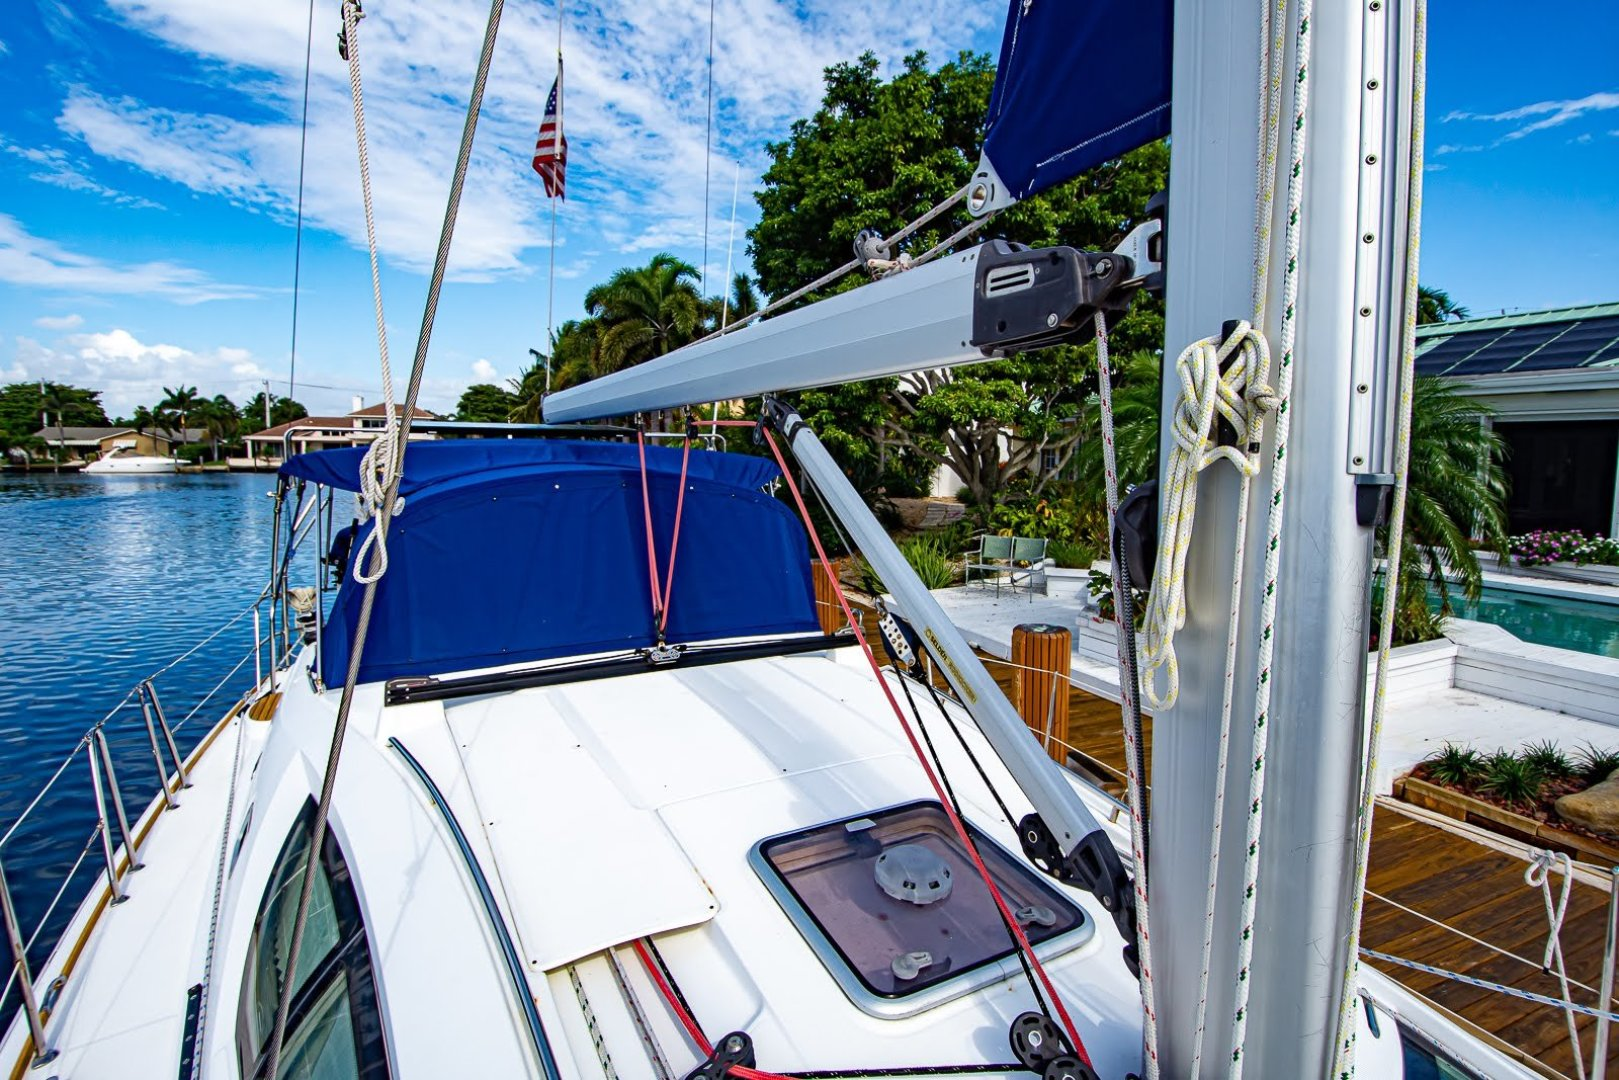 Jeanneau-42DS 2007-Layla Fort Lauderdale-Florida-United States-Jeanneau 42DS-1551270 | Thumbnail